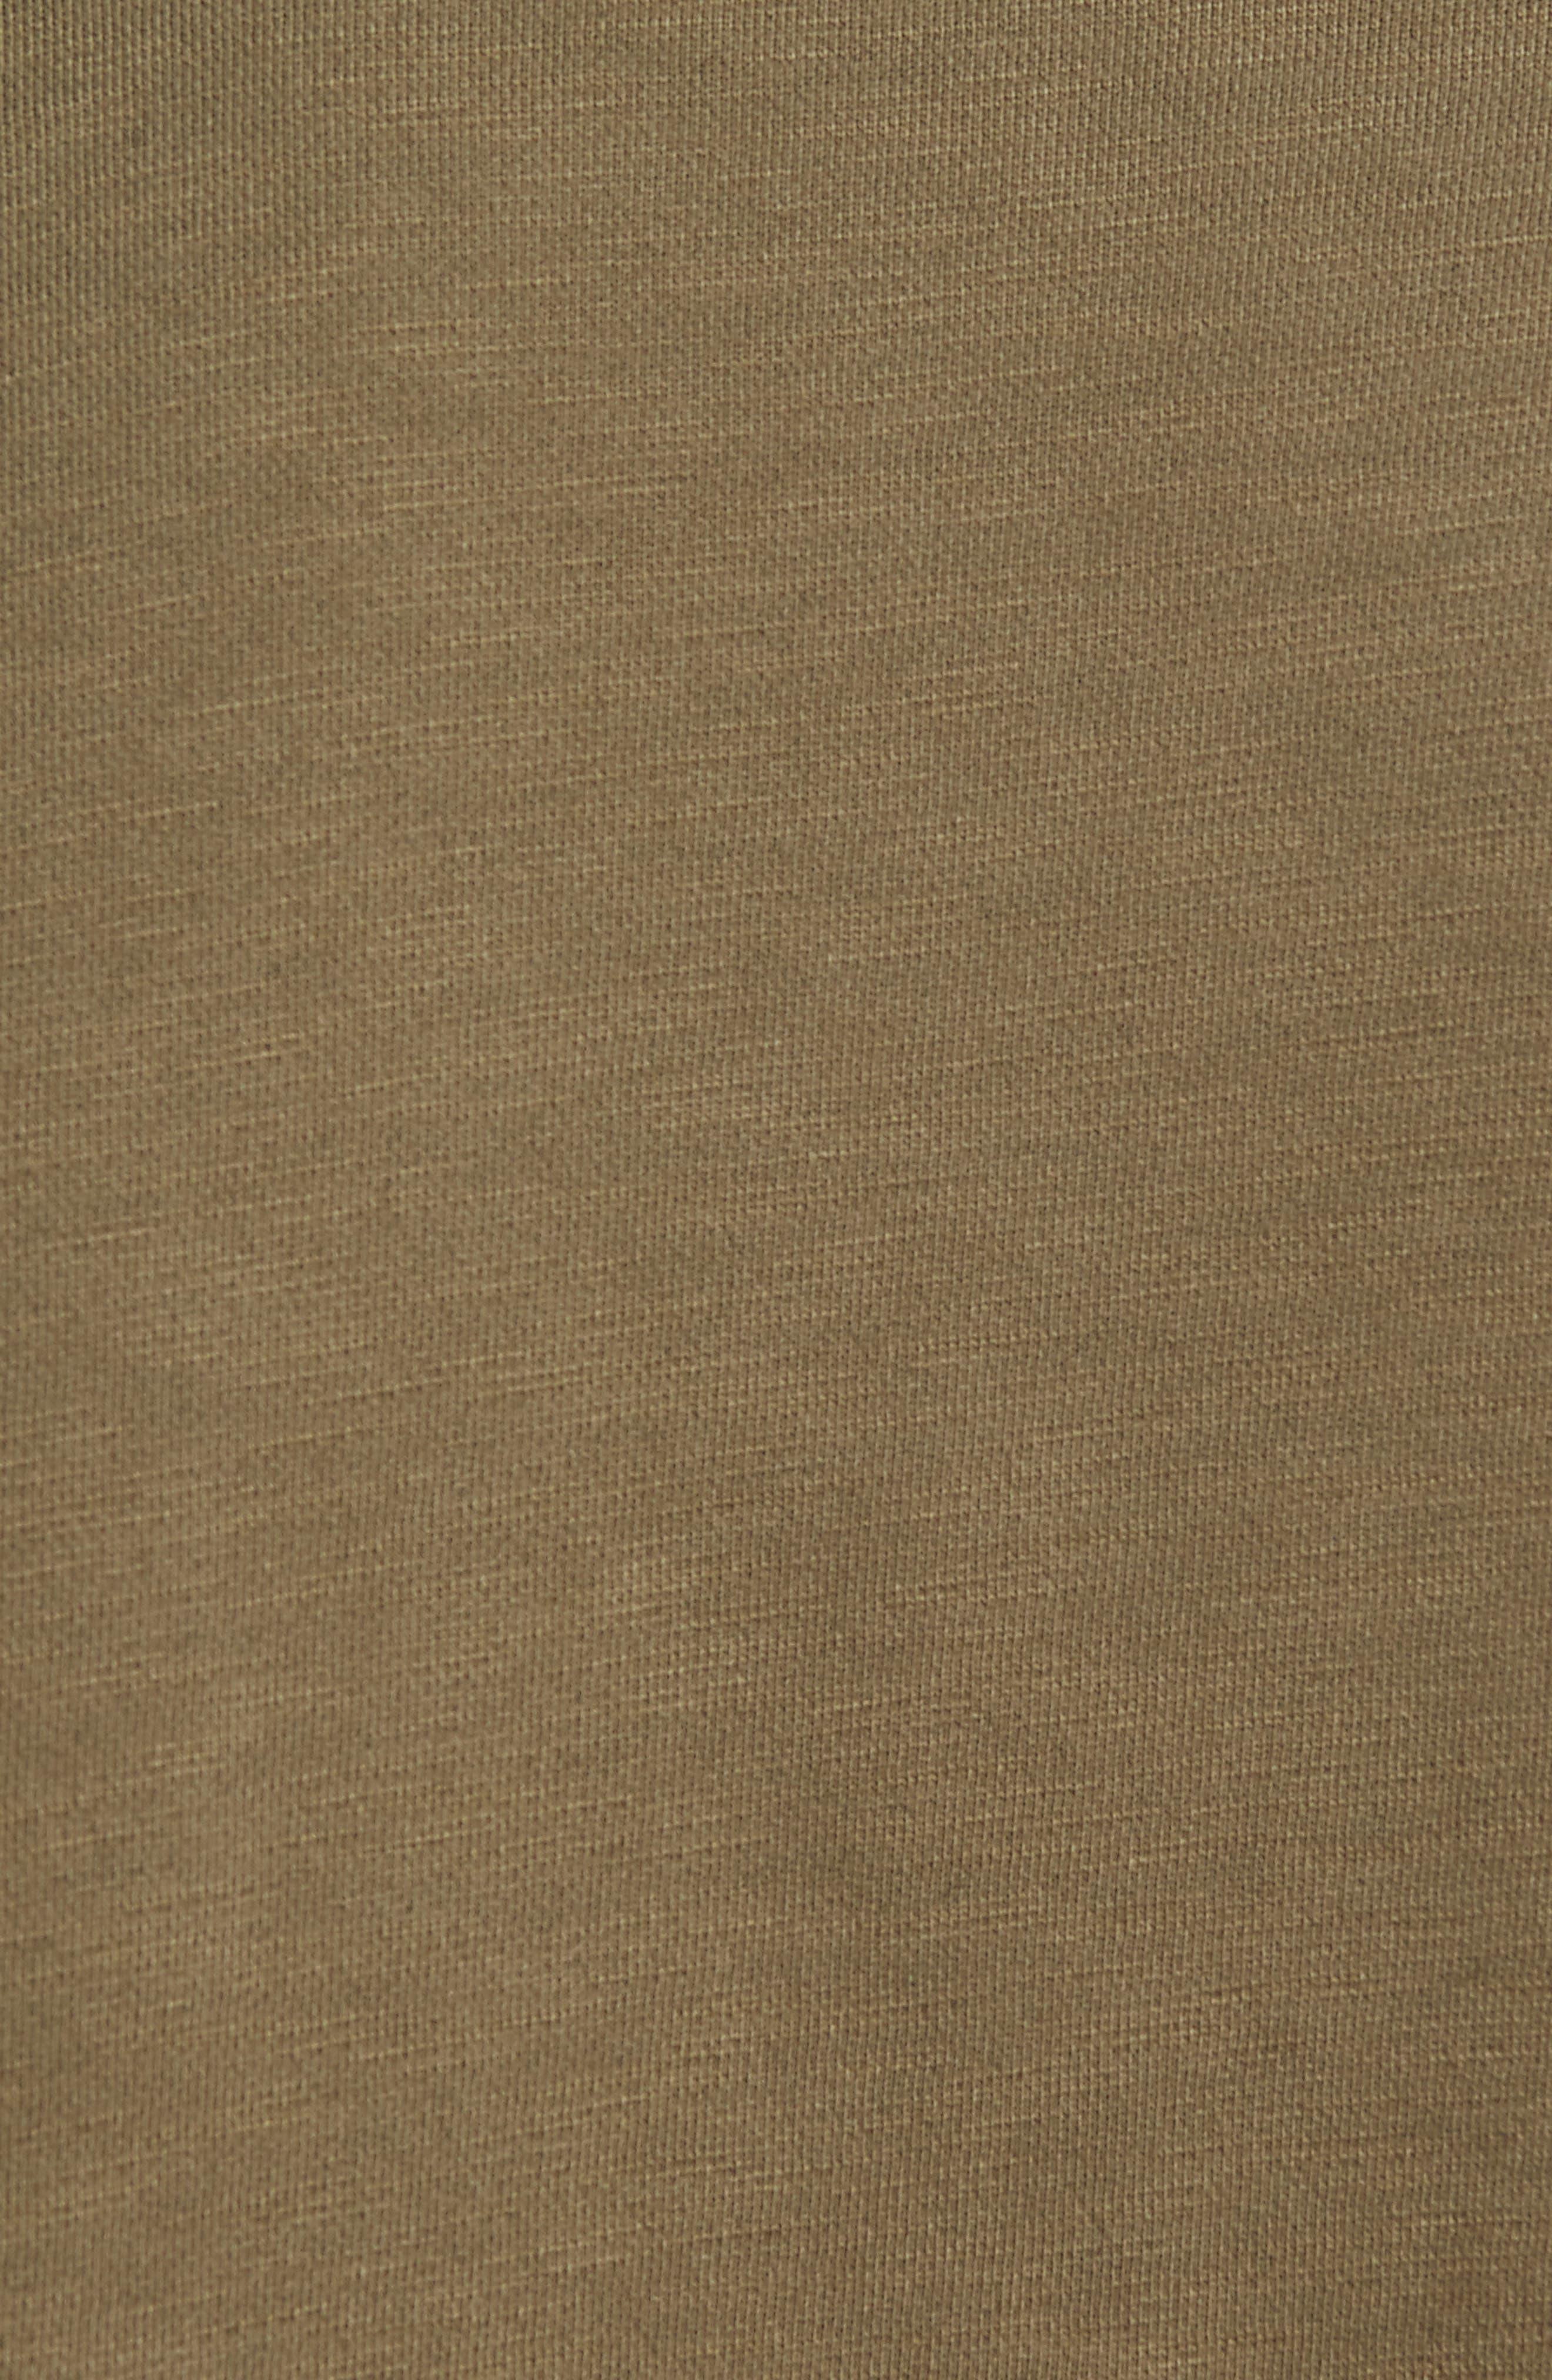 Crewneck Sweatshirt,                             Alternate thumbnail 5, color,                             319